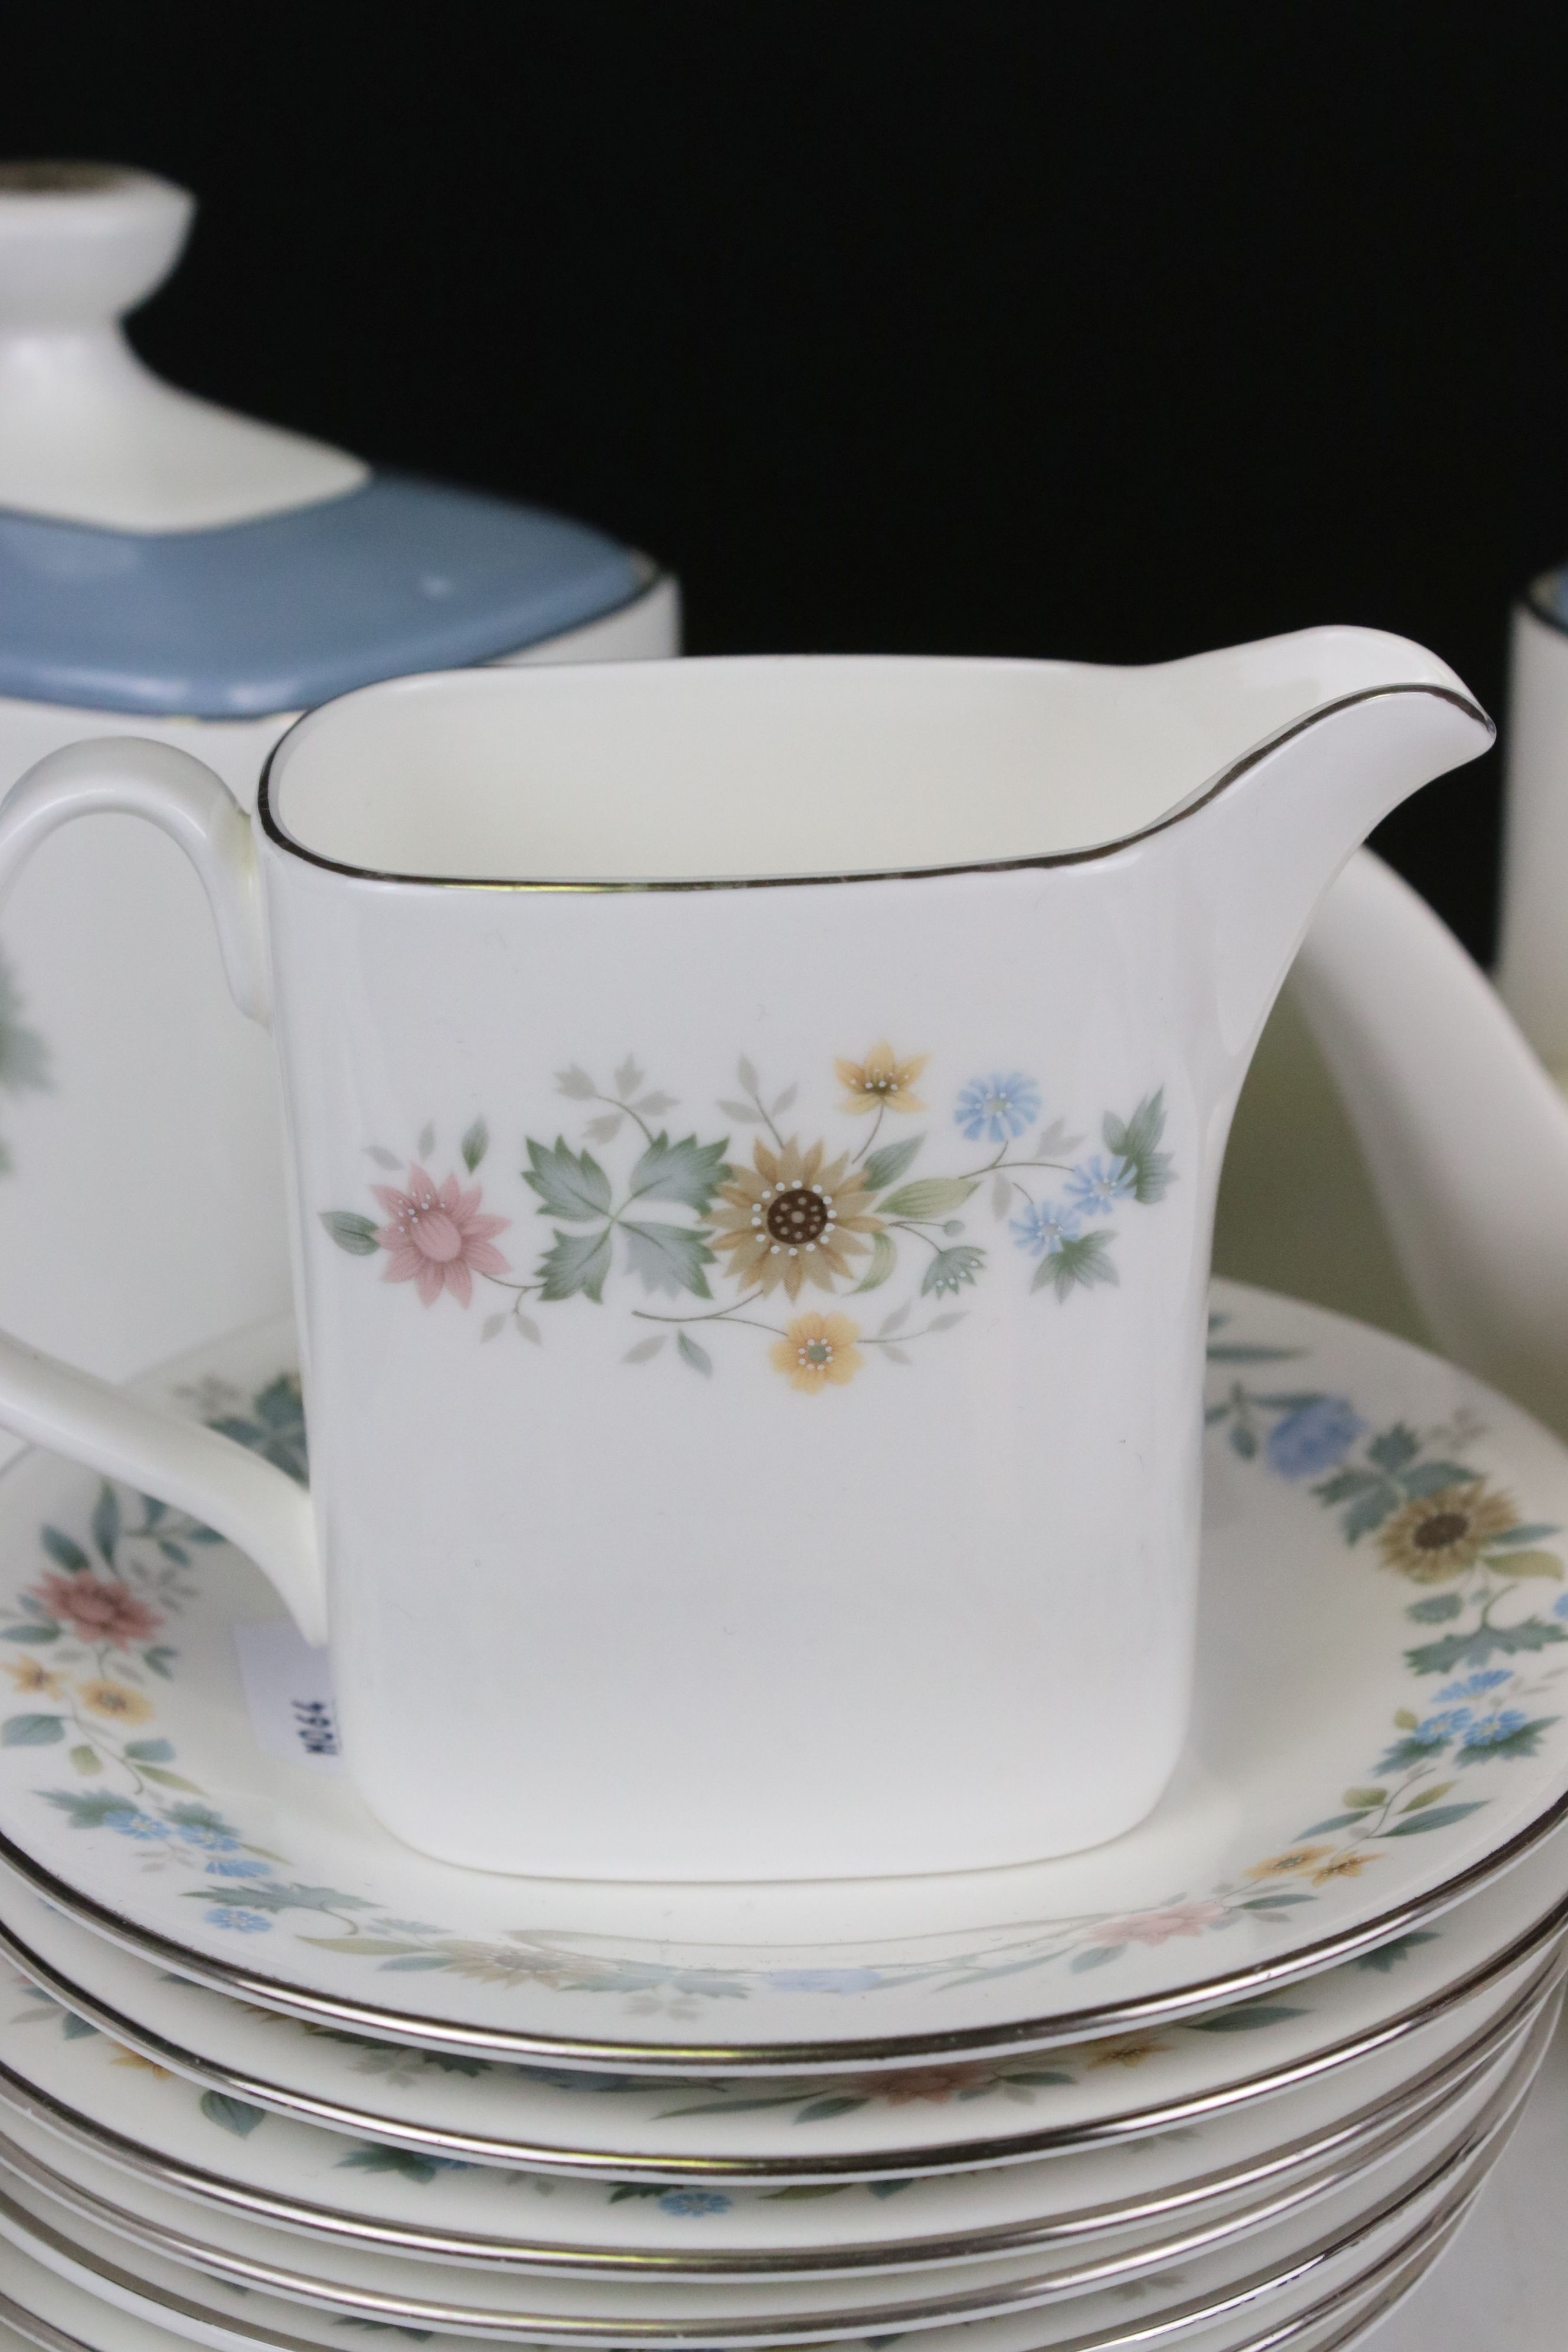 Royal Doulton ' Pastorale ' Tea Set comprising Two Teapots, Milk, Sugar, 6 Cups and 7 Saucers - Image 2 of 7